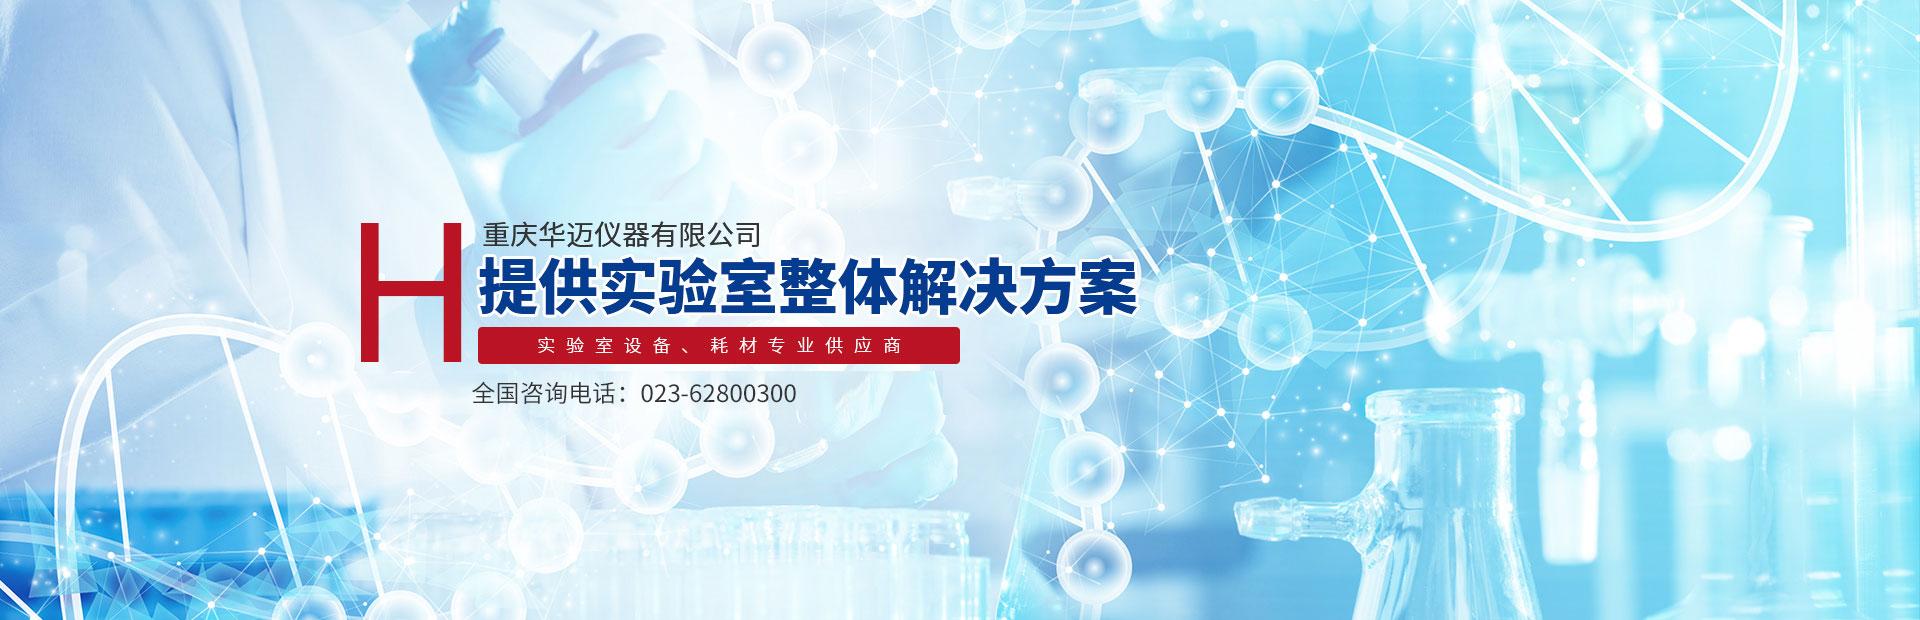 重庆3M测试片